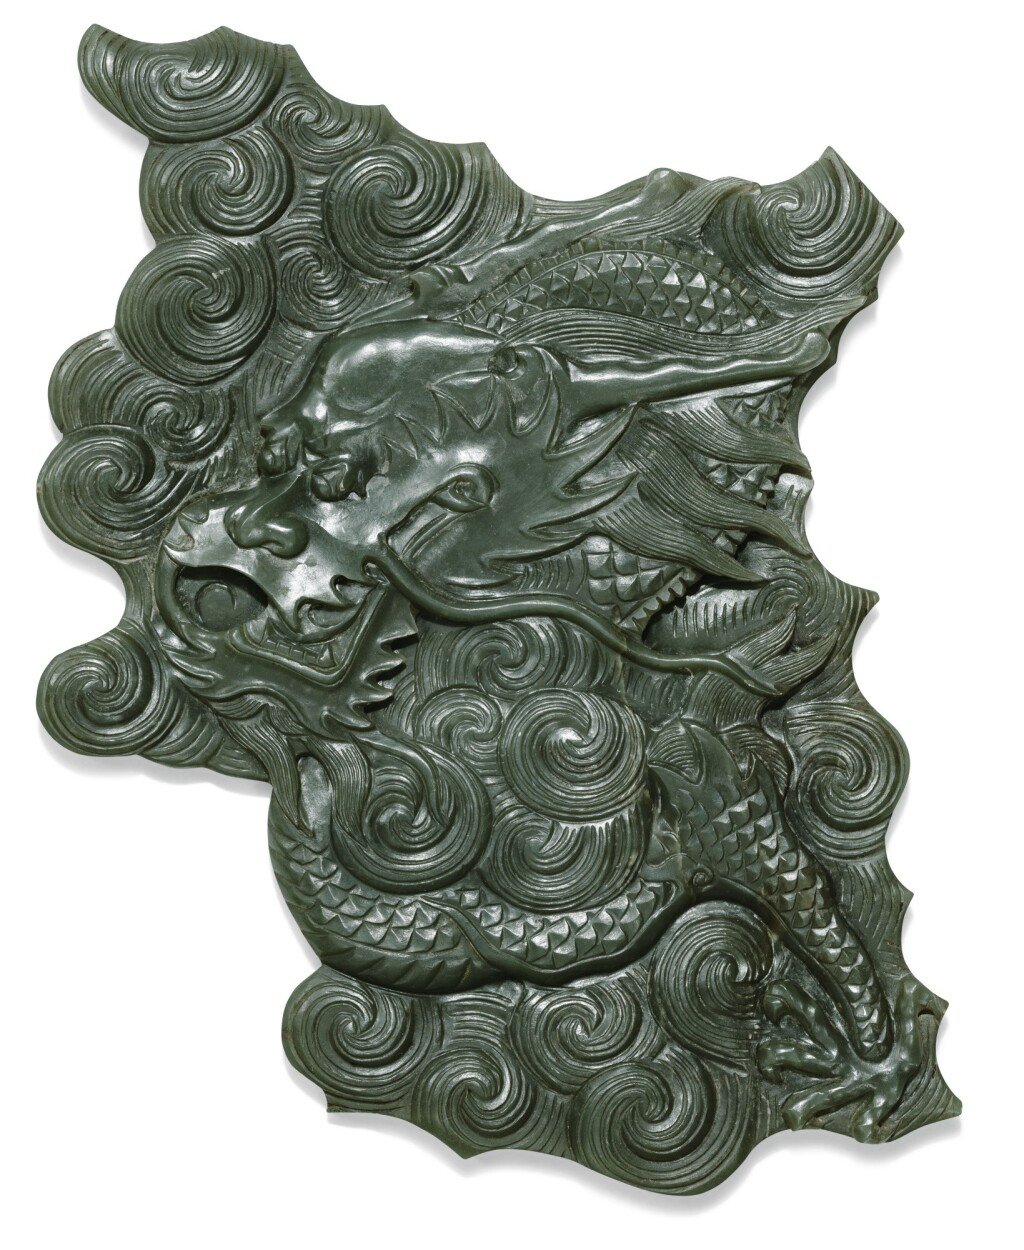 FRAGMENT EN JADE VERT ÉPINARD DYNASTIE QING | 清 青玉雲龍紋殘片 | A  spinach green jade 'dragon' fragment, Qing Dynasty